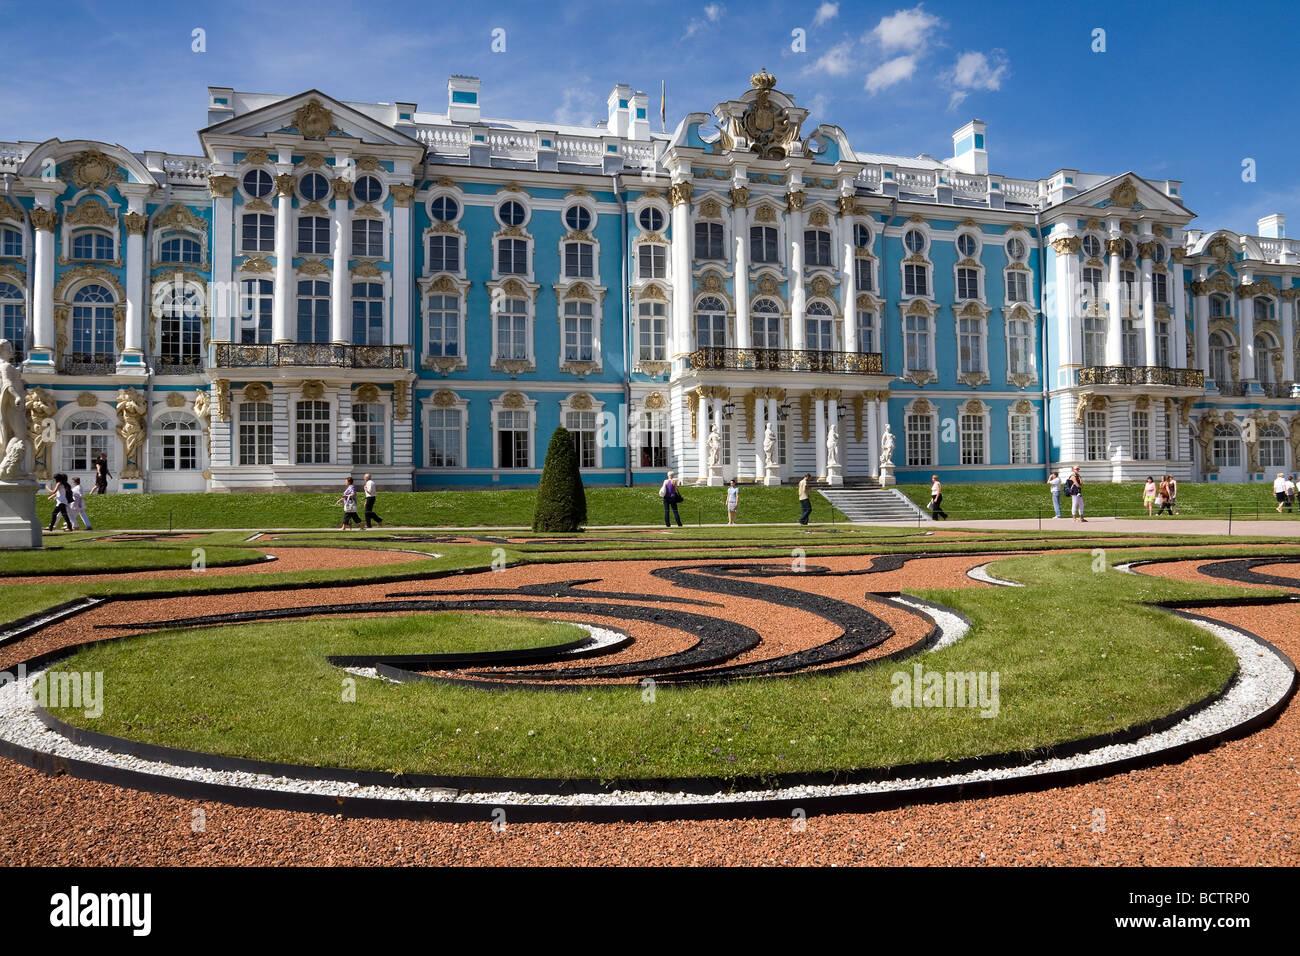 Grand Palace Pushkin Tsarskoe selo St Petersburg Russia ...